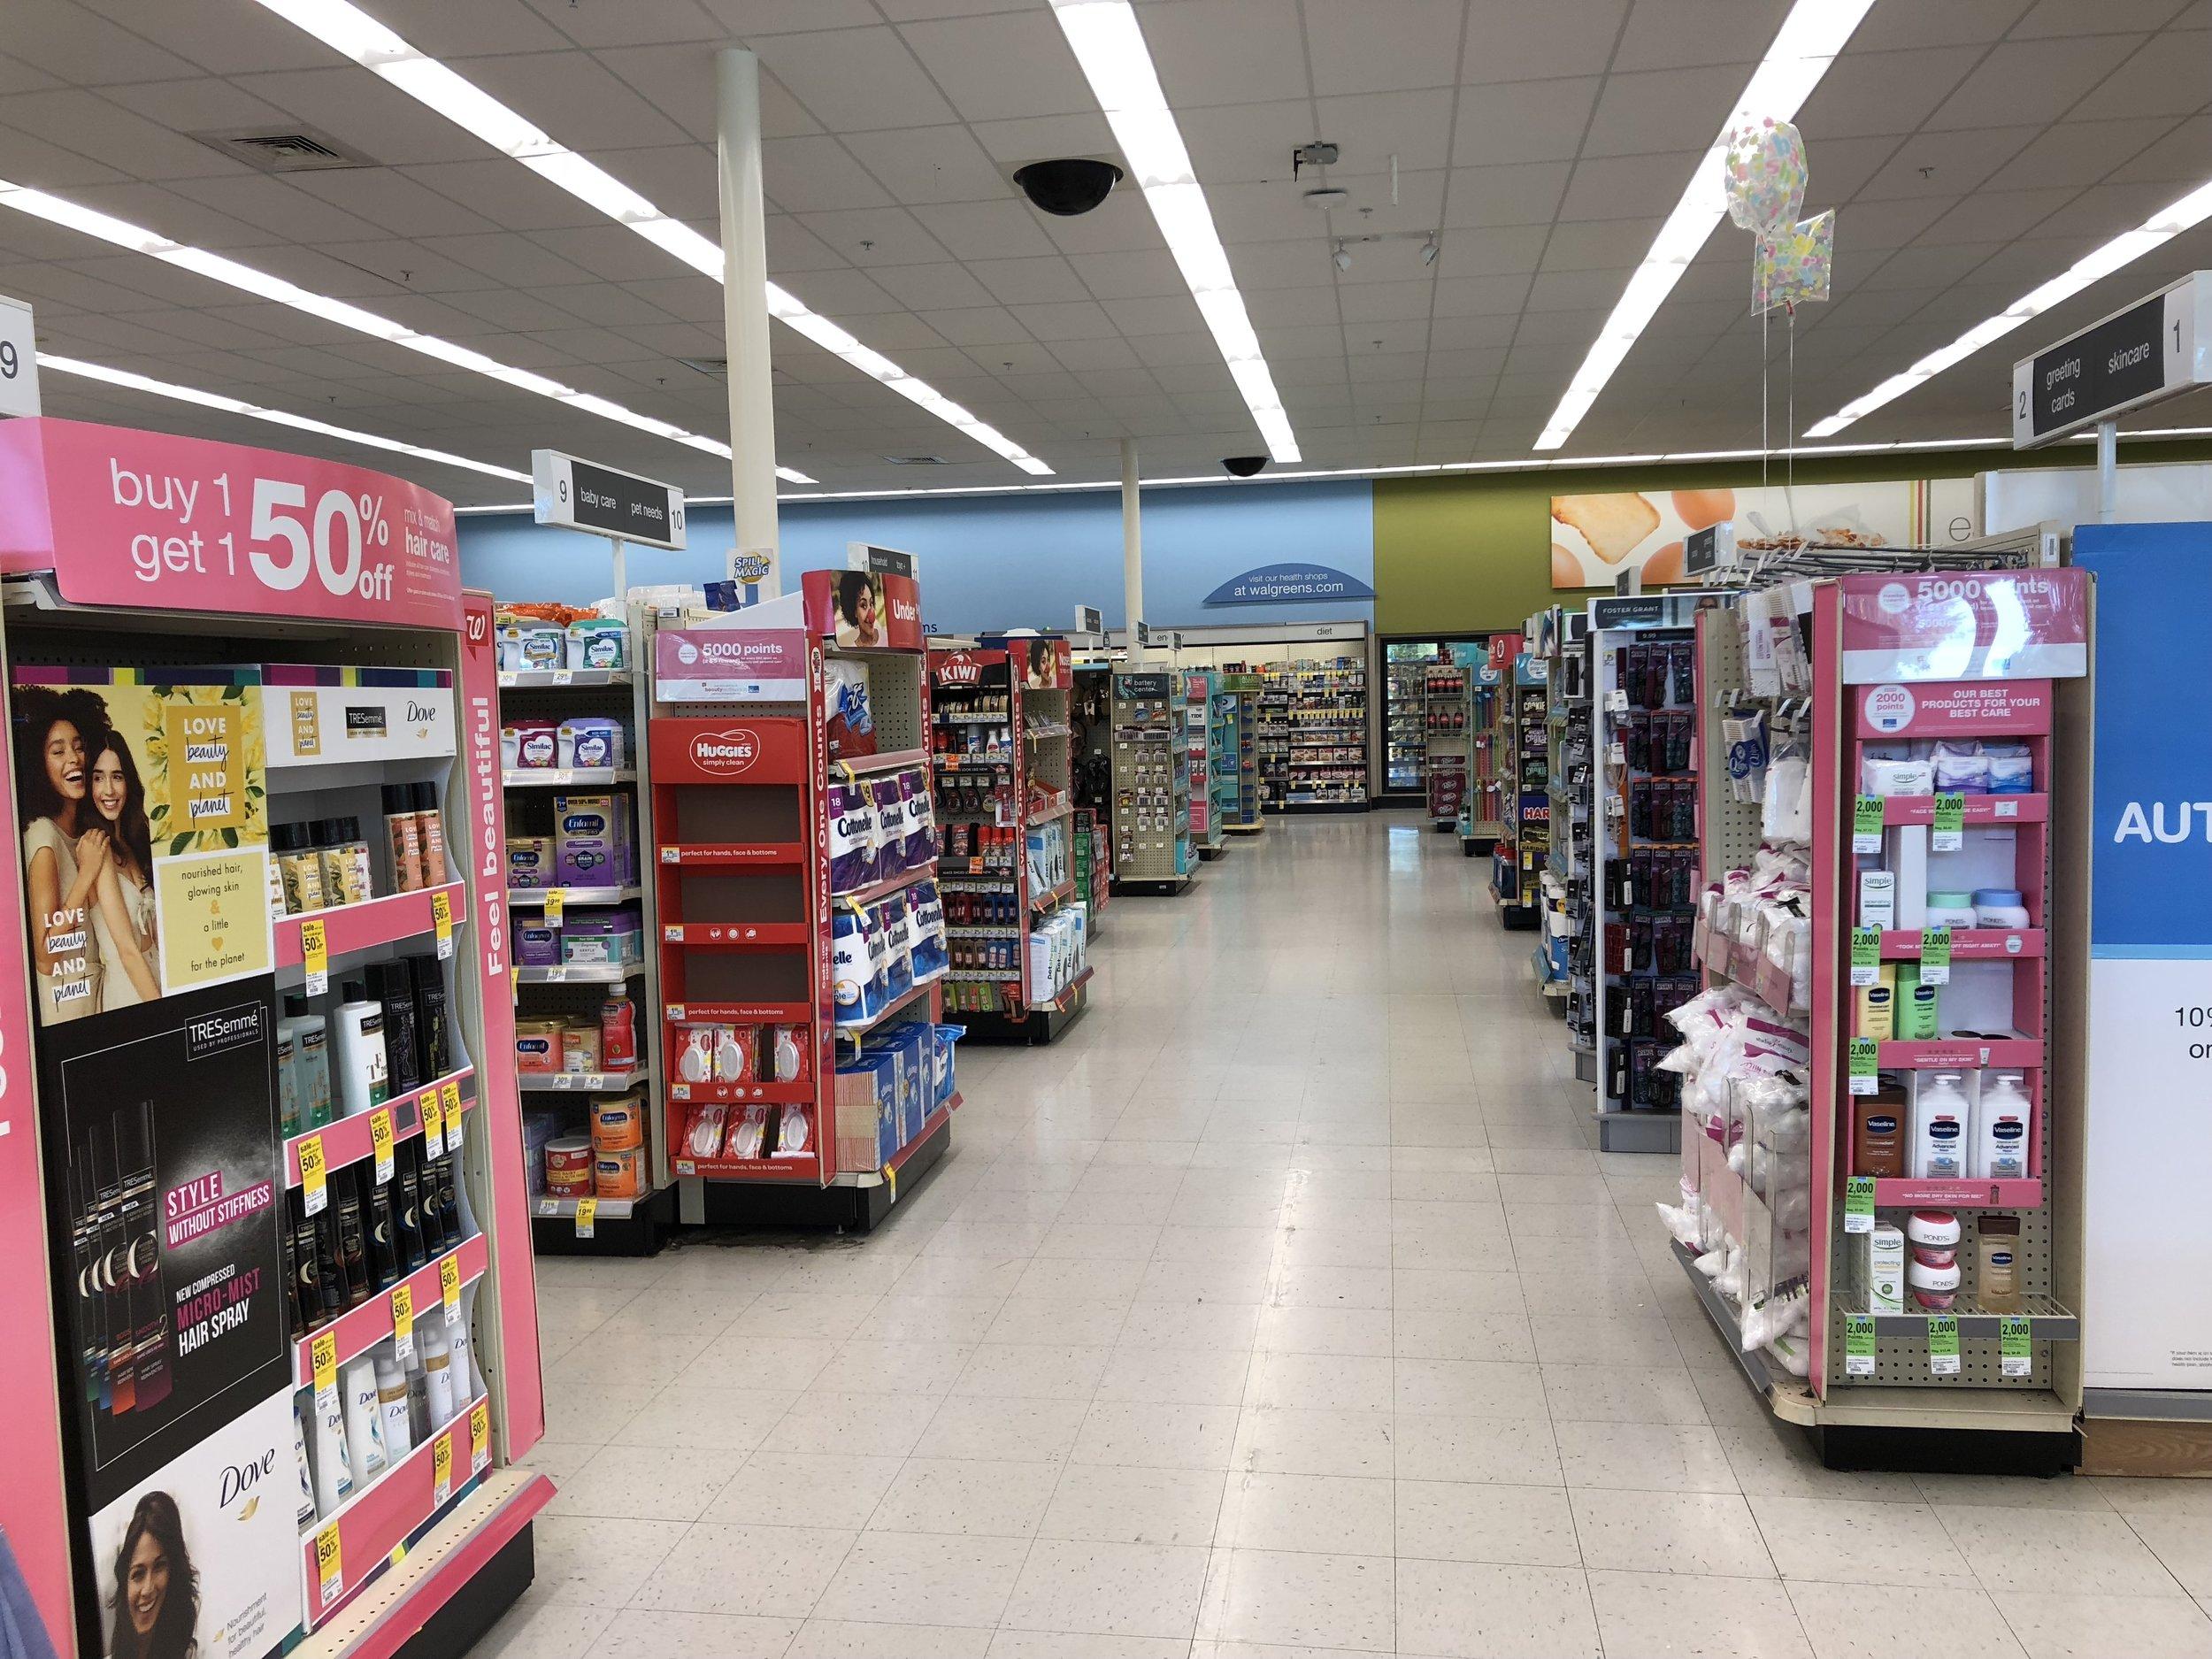 Inside a Walgreens drugstore